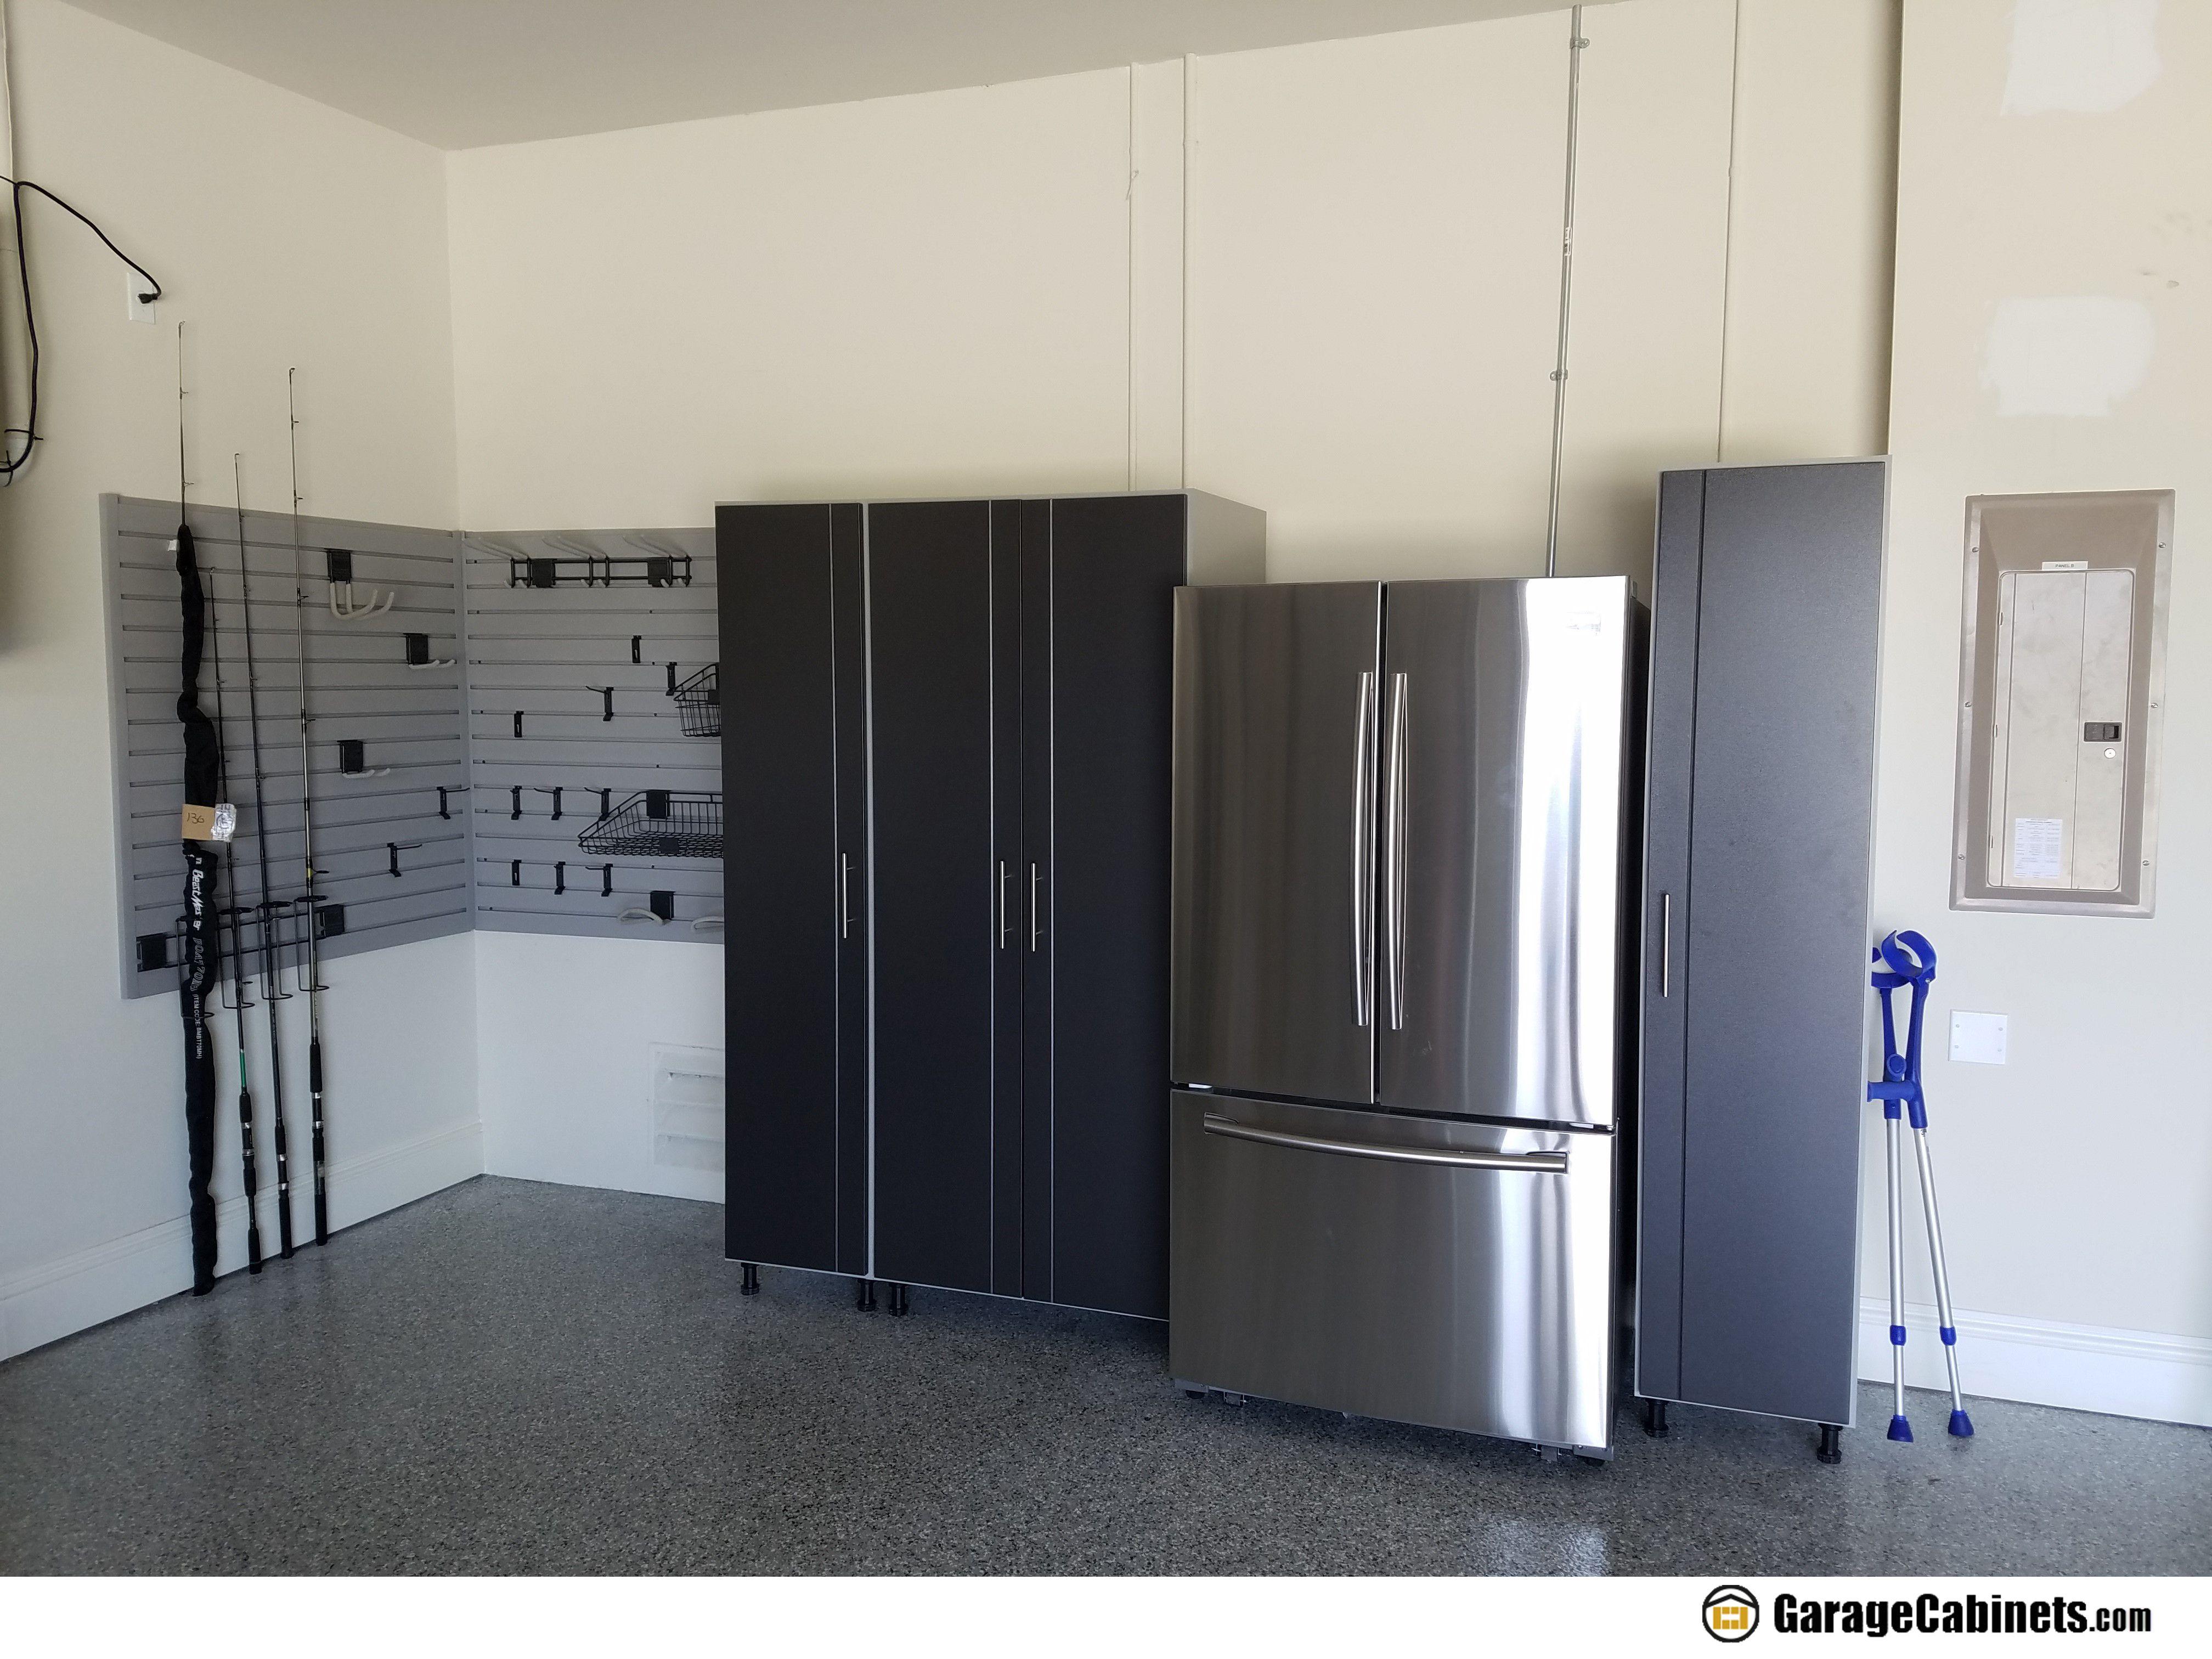 Garagecabinets Com Manufactures The Finest Custom Garage Storage